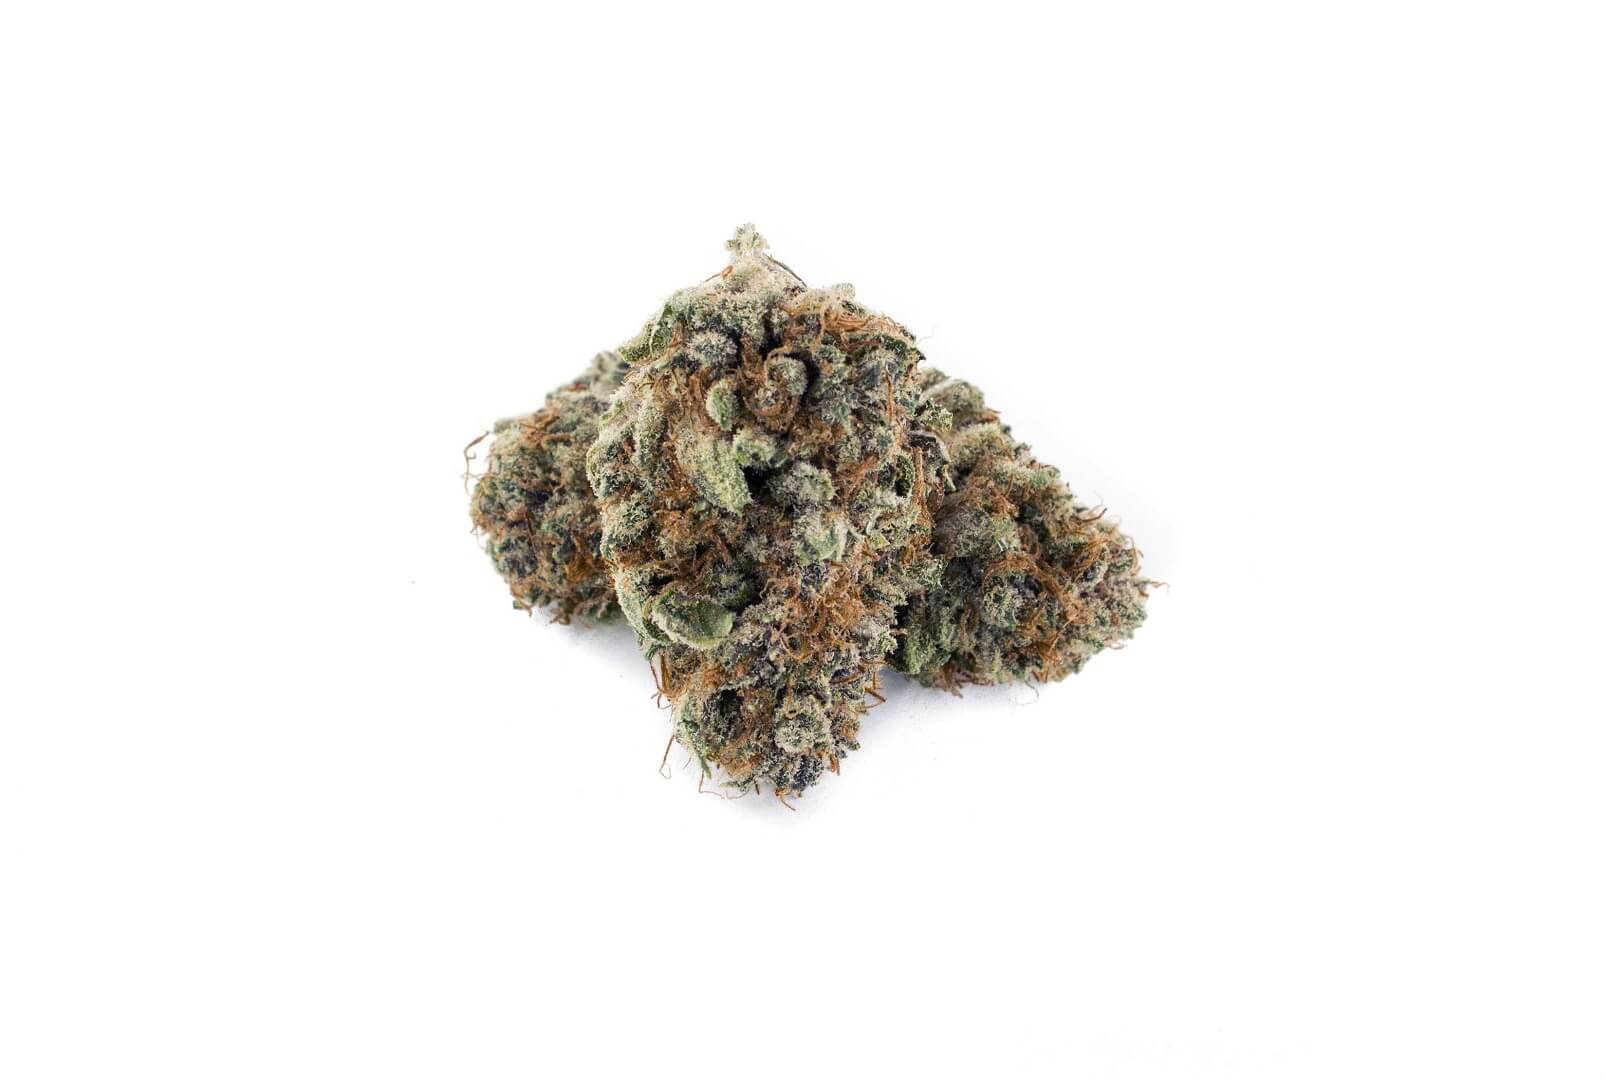 Blueberry Muffin strain photo 2